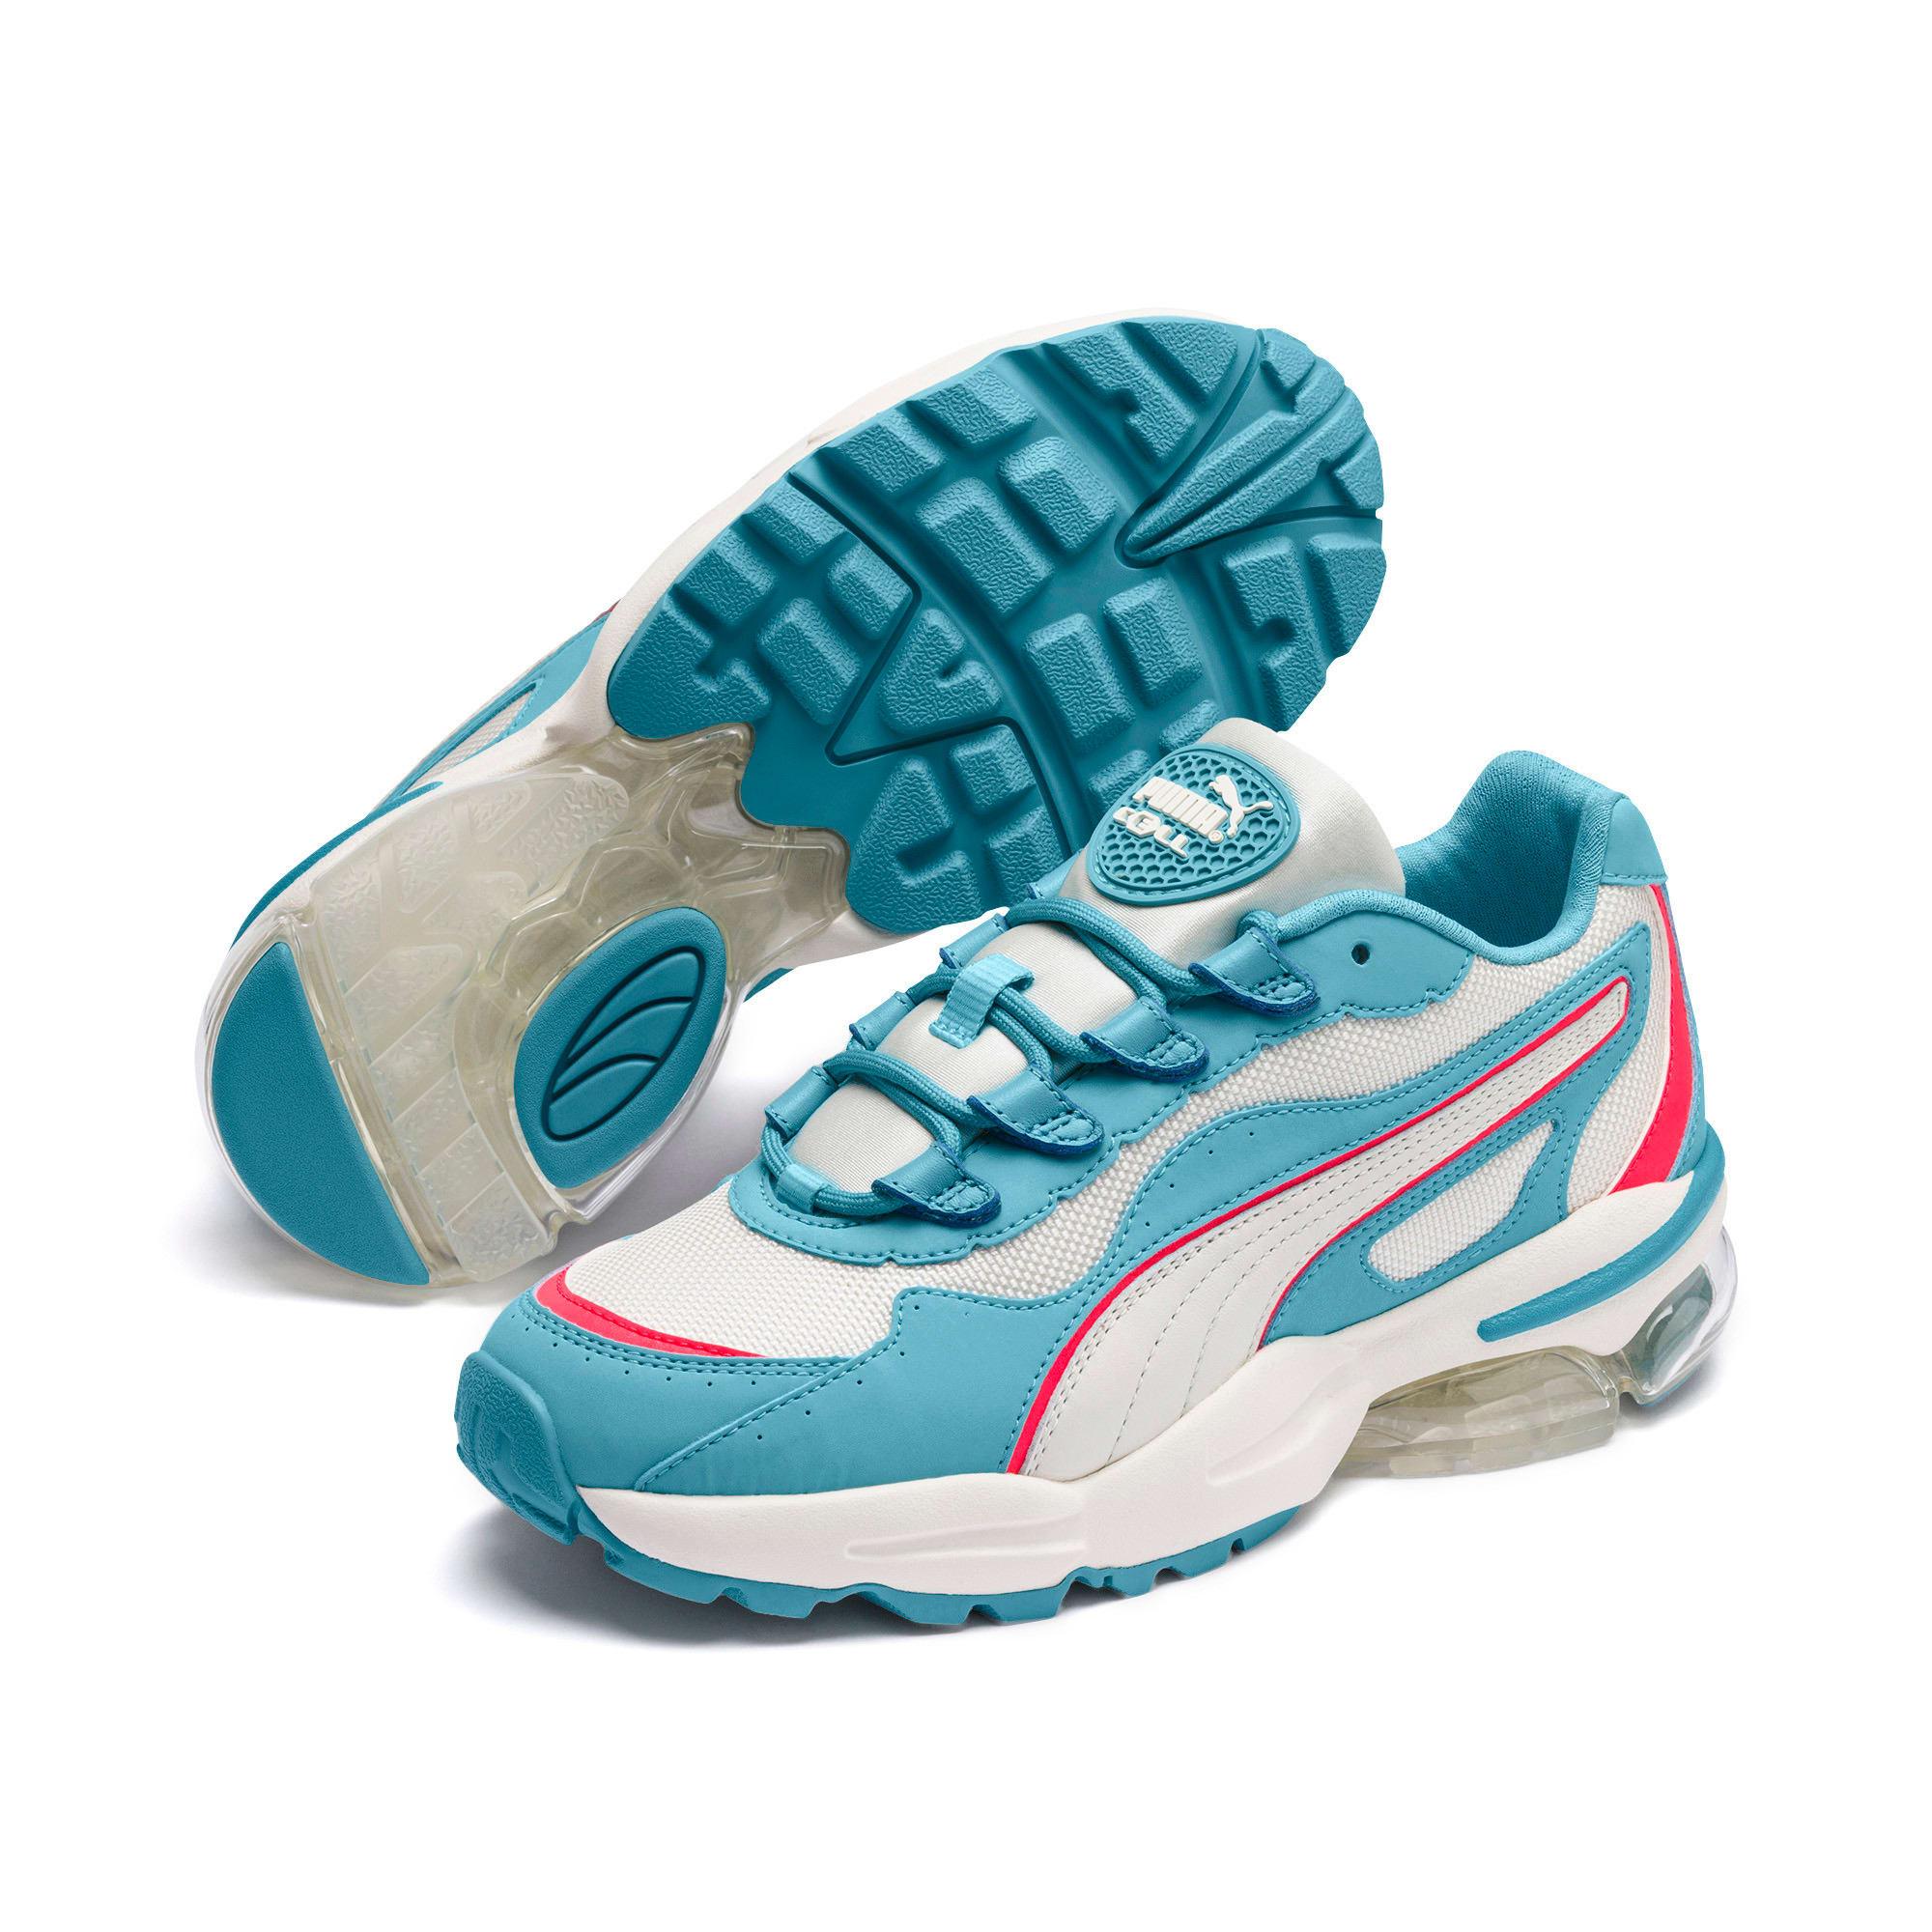 Thumbnail 3 of CELL Stellar Damen Sneaker, Milky Blue-Puma Team Gold, medium